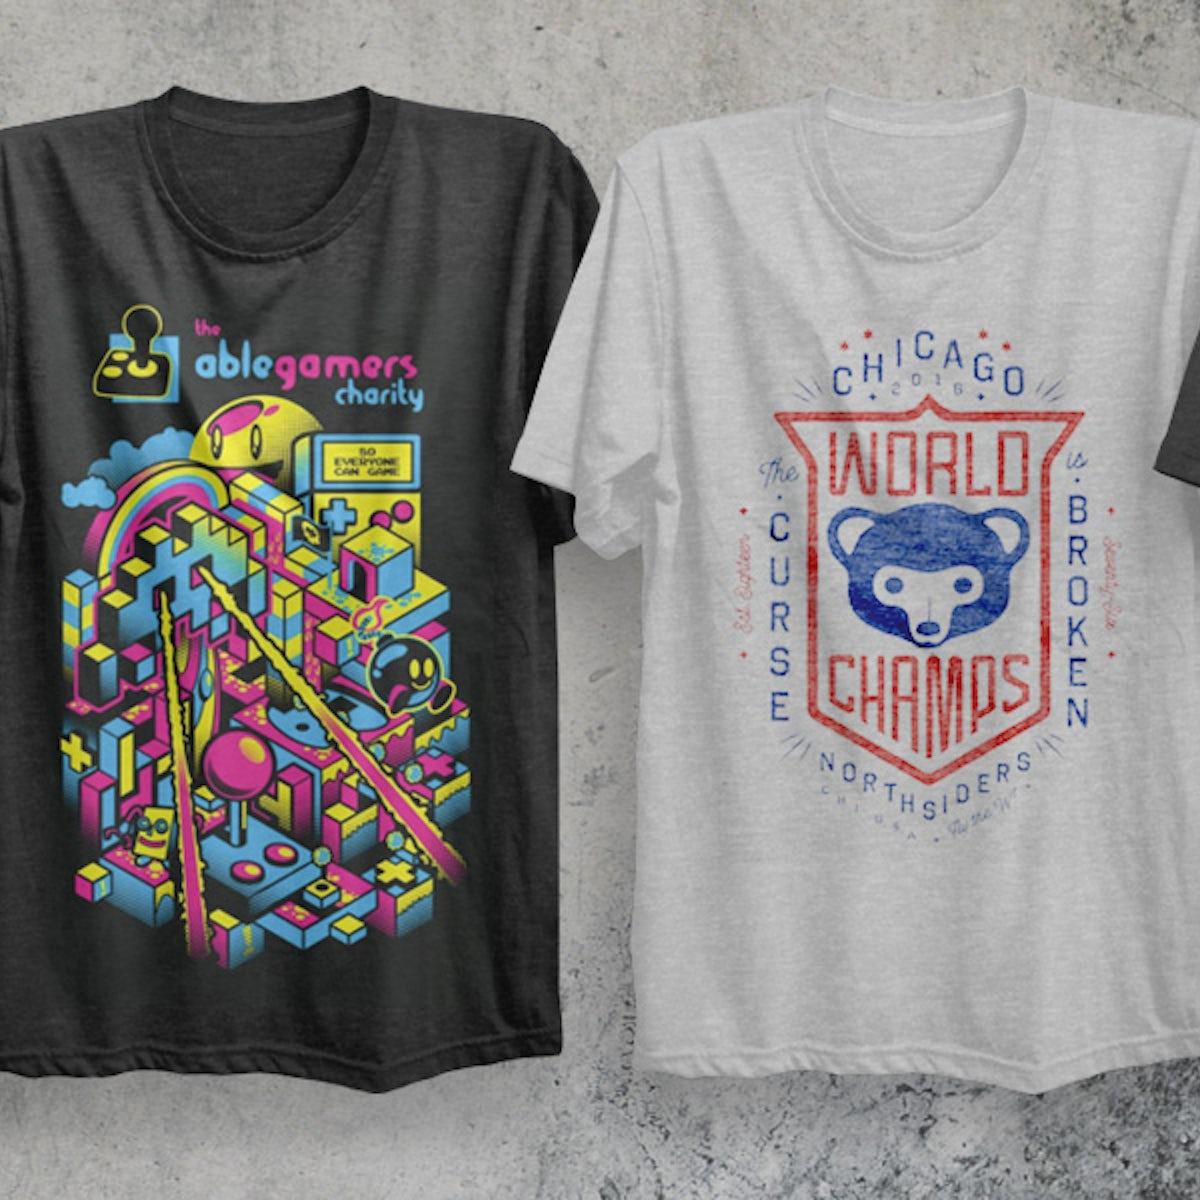 5eabcd244af8 50 t-shirt design ideas that won t wear out - 99designs